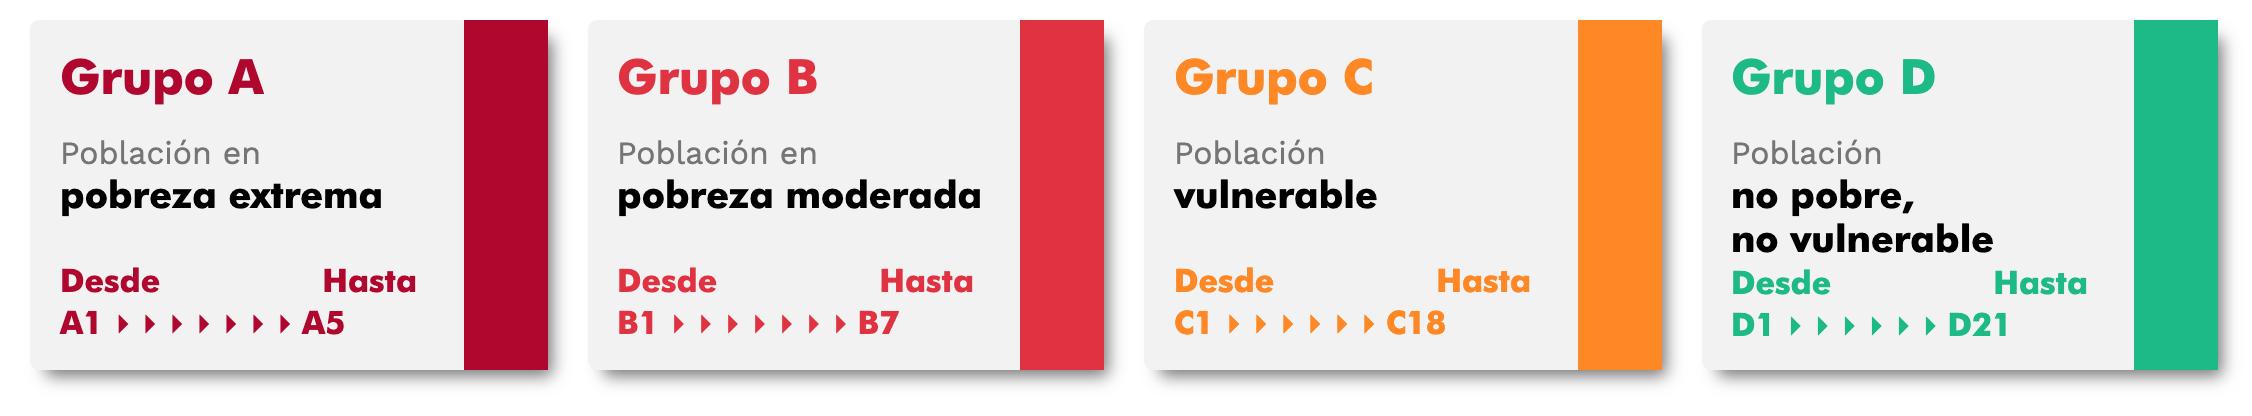 Grupos_Sisben